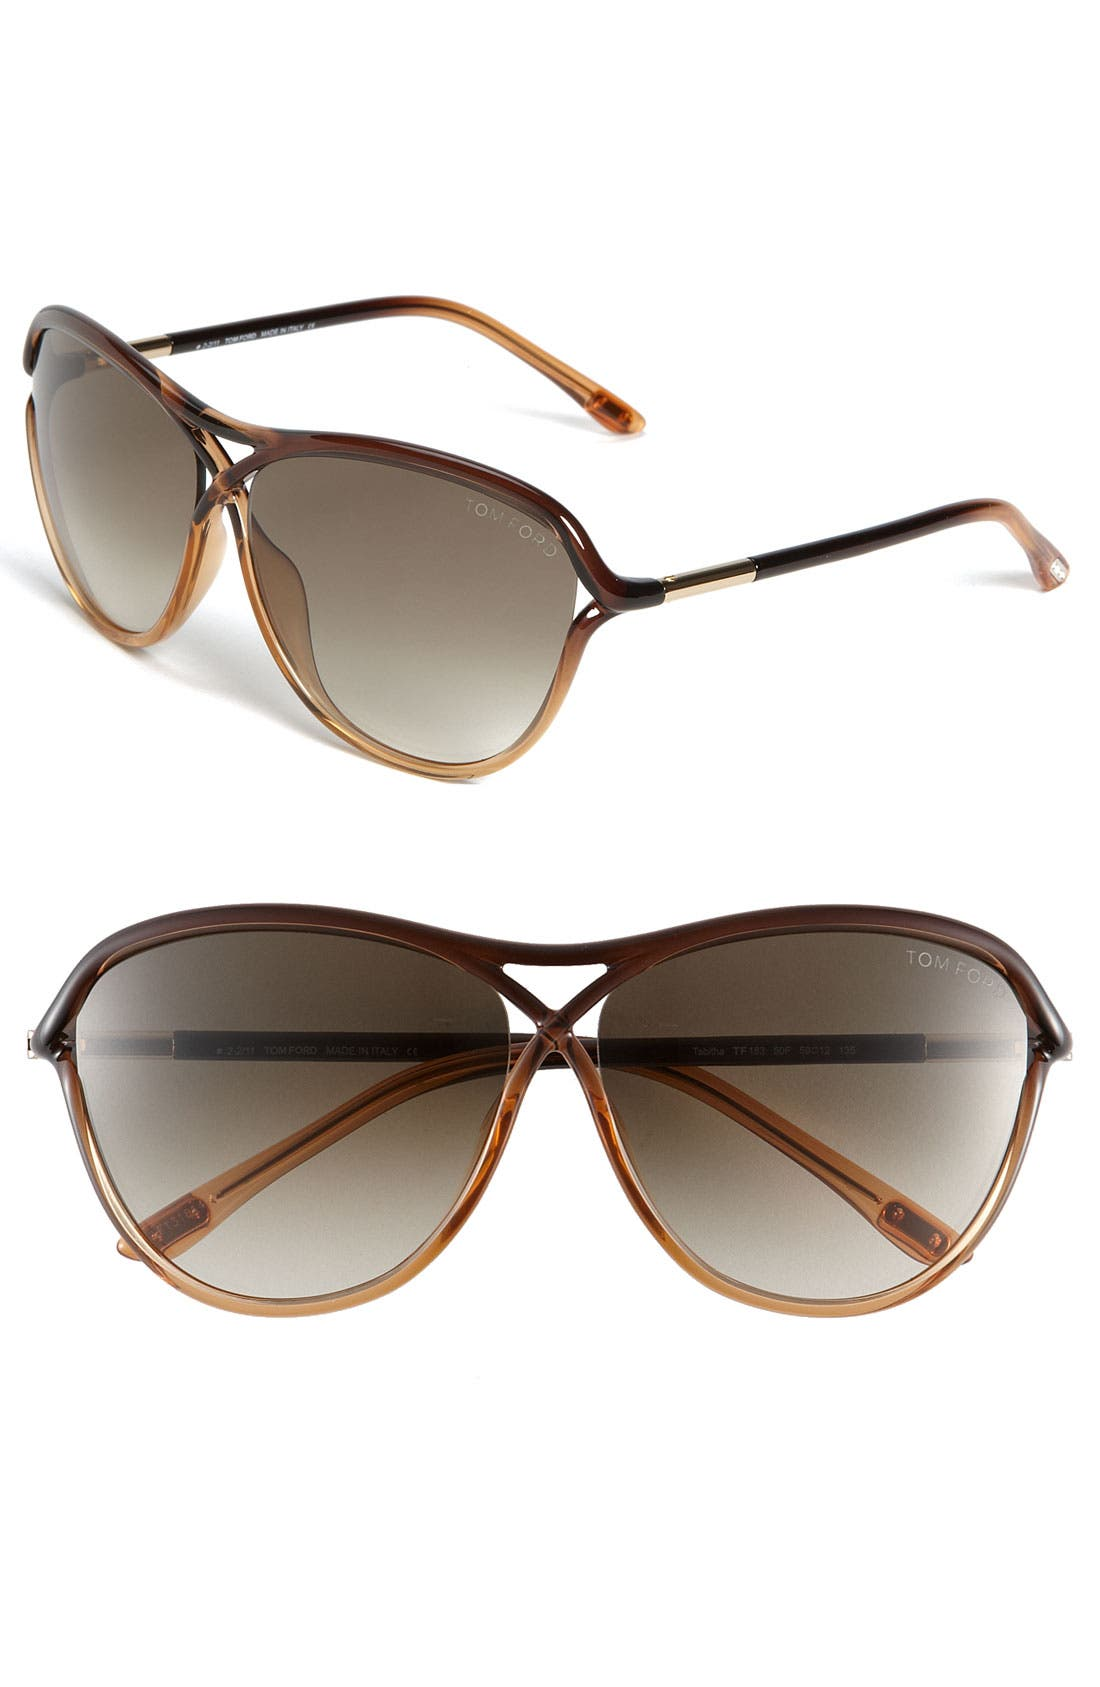 Main Image - Tom Ford 'Tabitha' Aviator Sunglasses